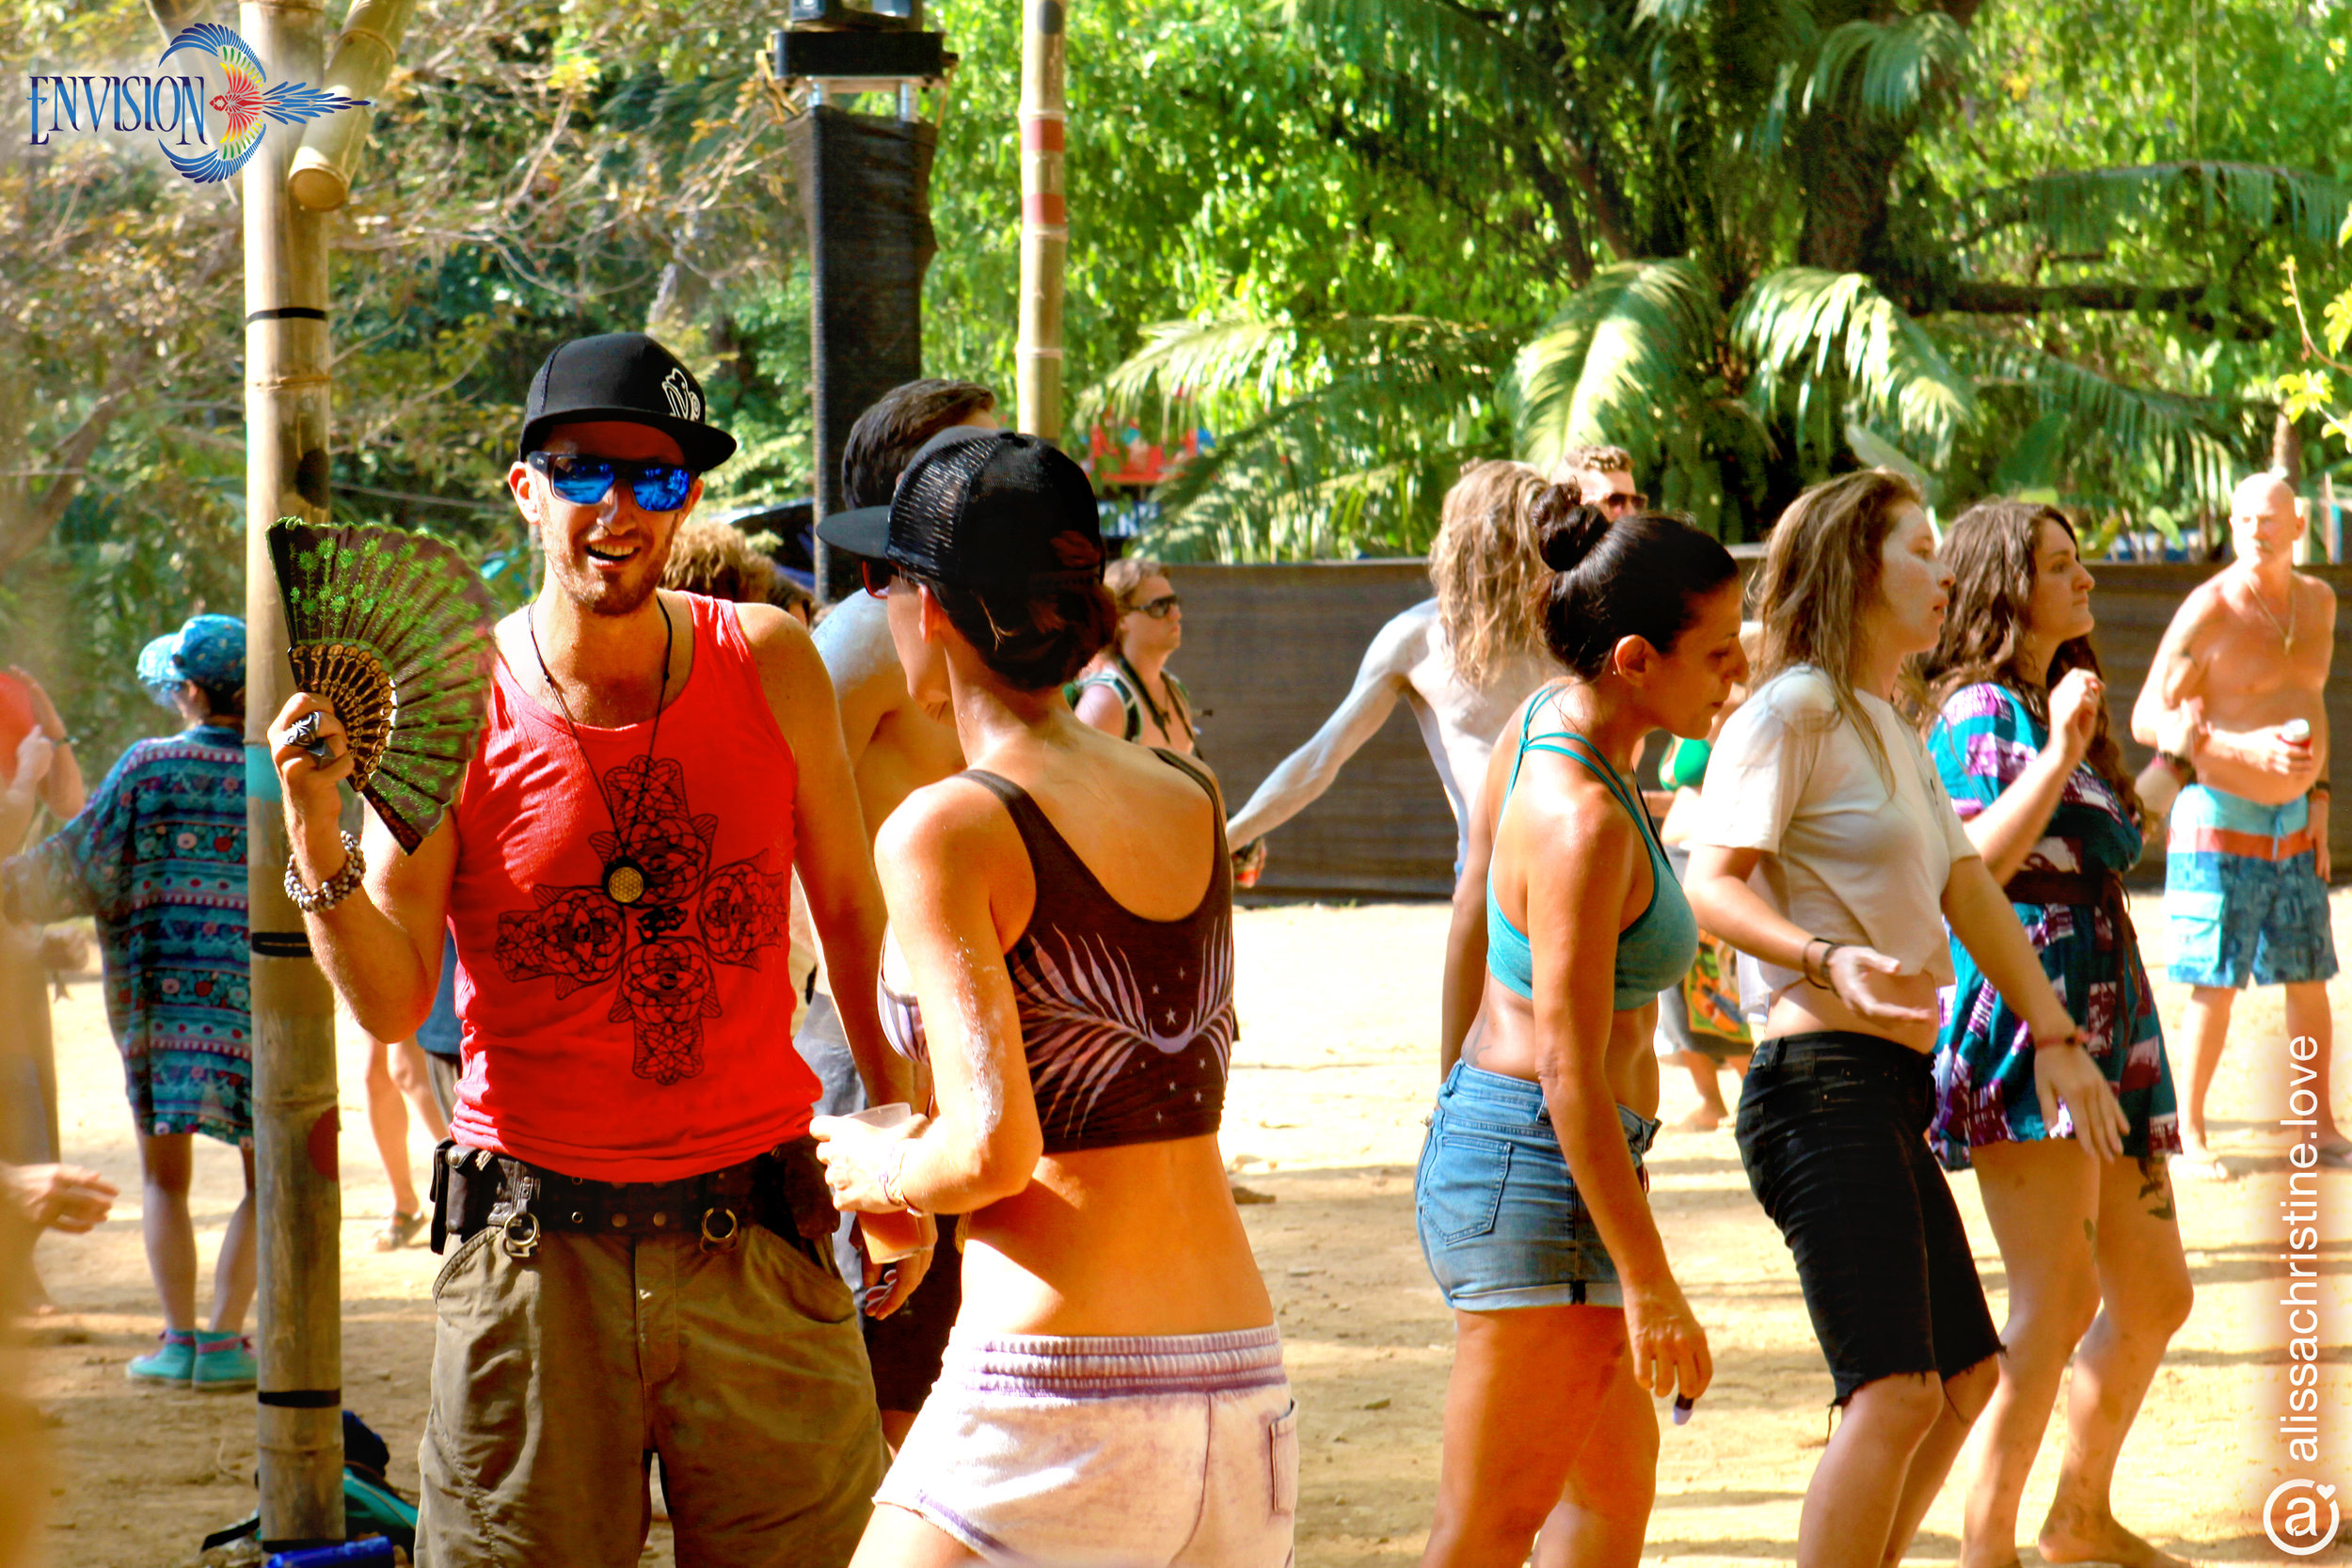 alissaChristine-ef-lapa-funkhunters-dancing-02-26-17-8620-lo.jpg